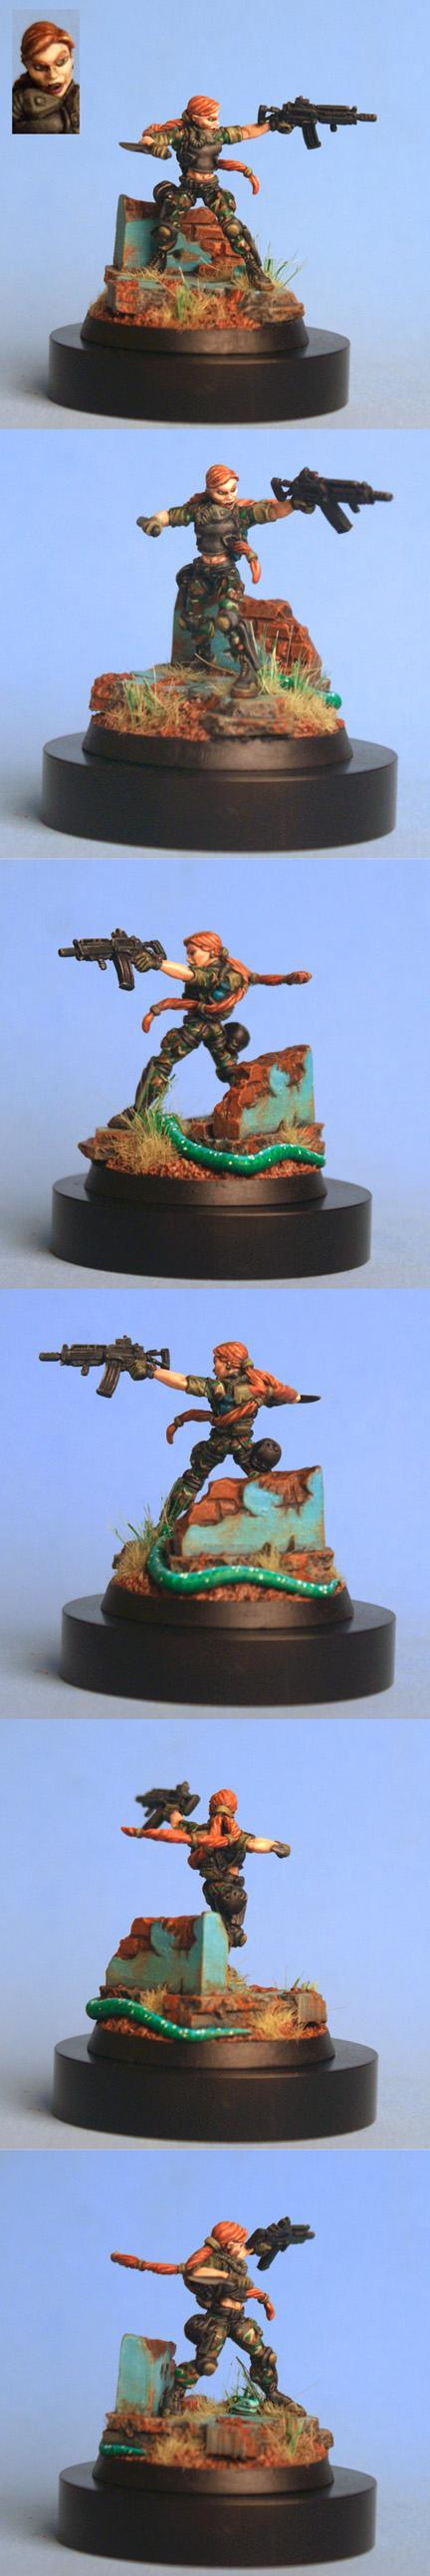 Ariadna, Infinity, Infinity Ariadna Para-Commando